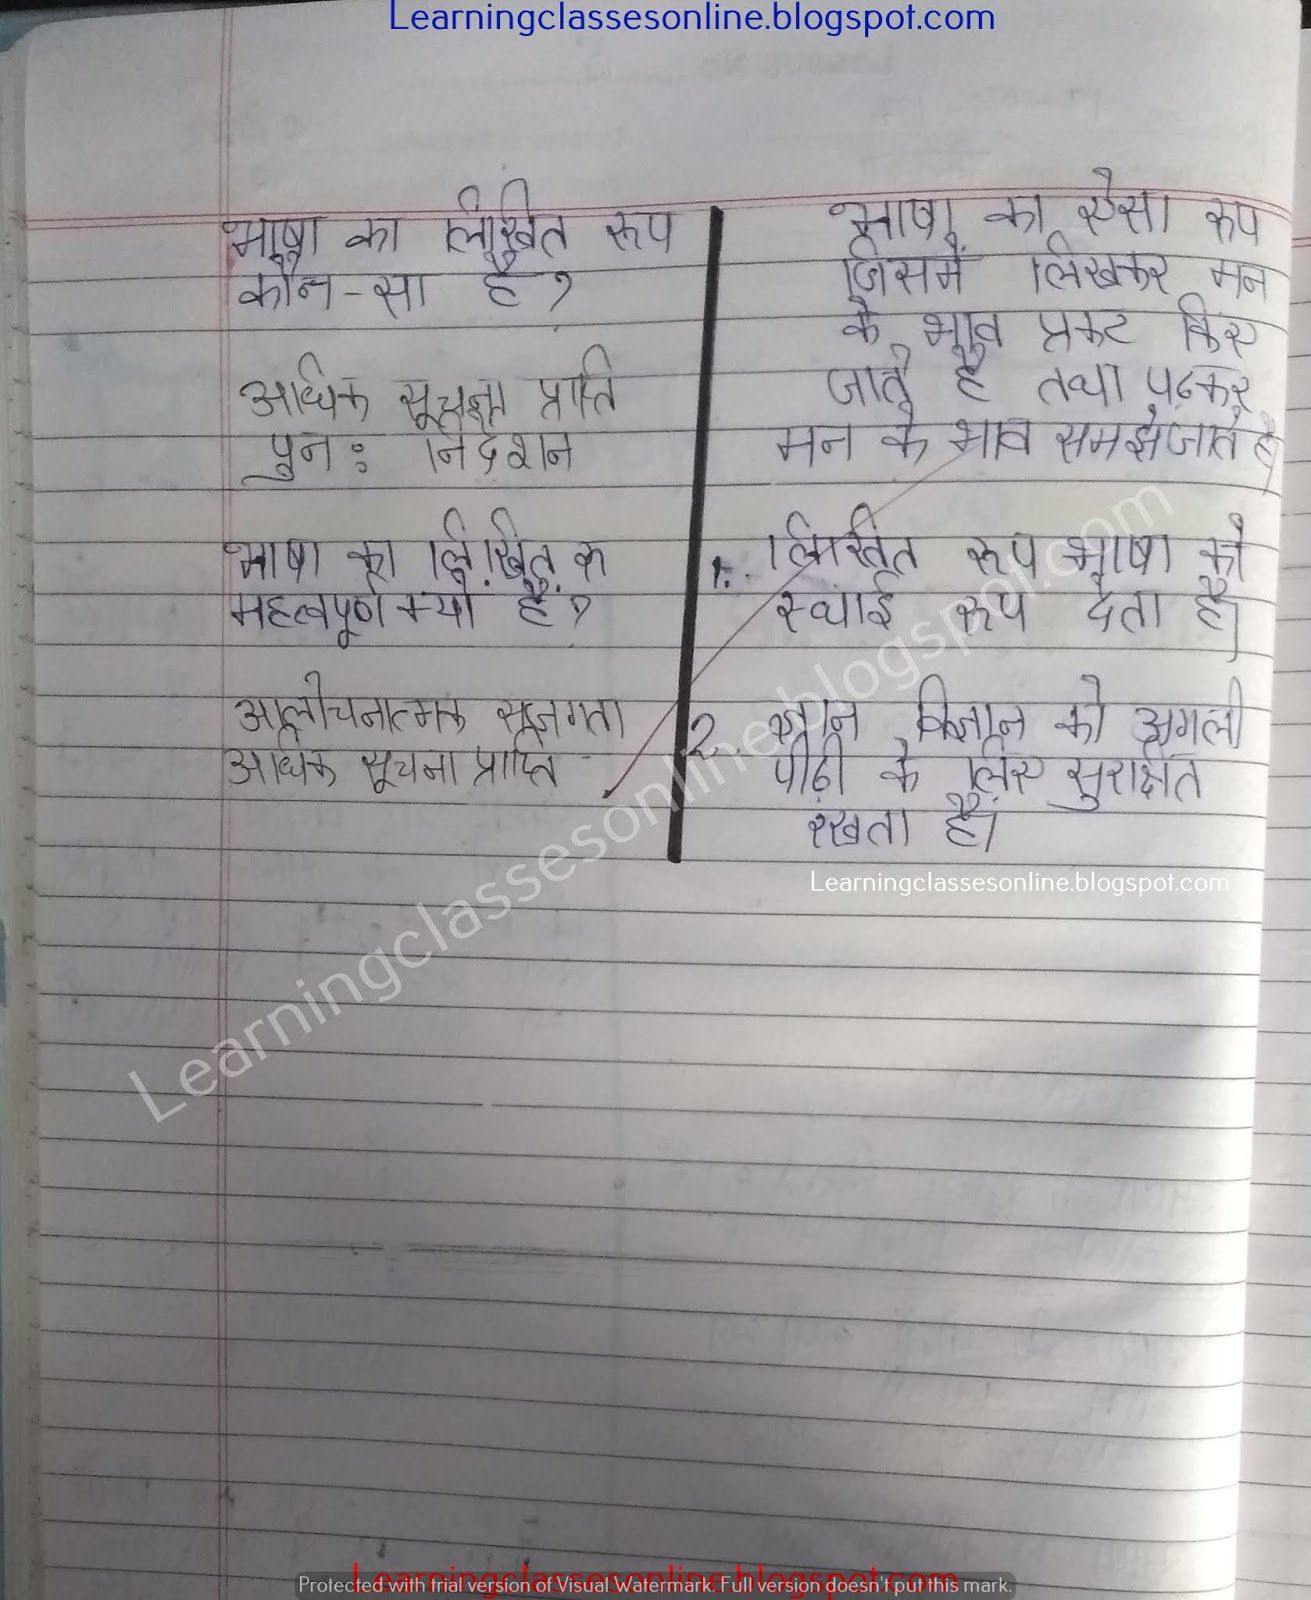 Hindi Vyakran Lesson Plan On Bhasha Class 6 To 10 Grammar Lesson Plans Grammar Lessons Lesson Plan In Hindi [ 1600 x 1311 Pixel ]